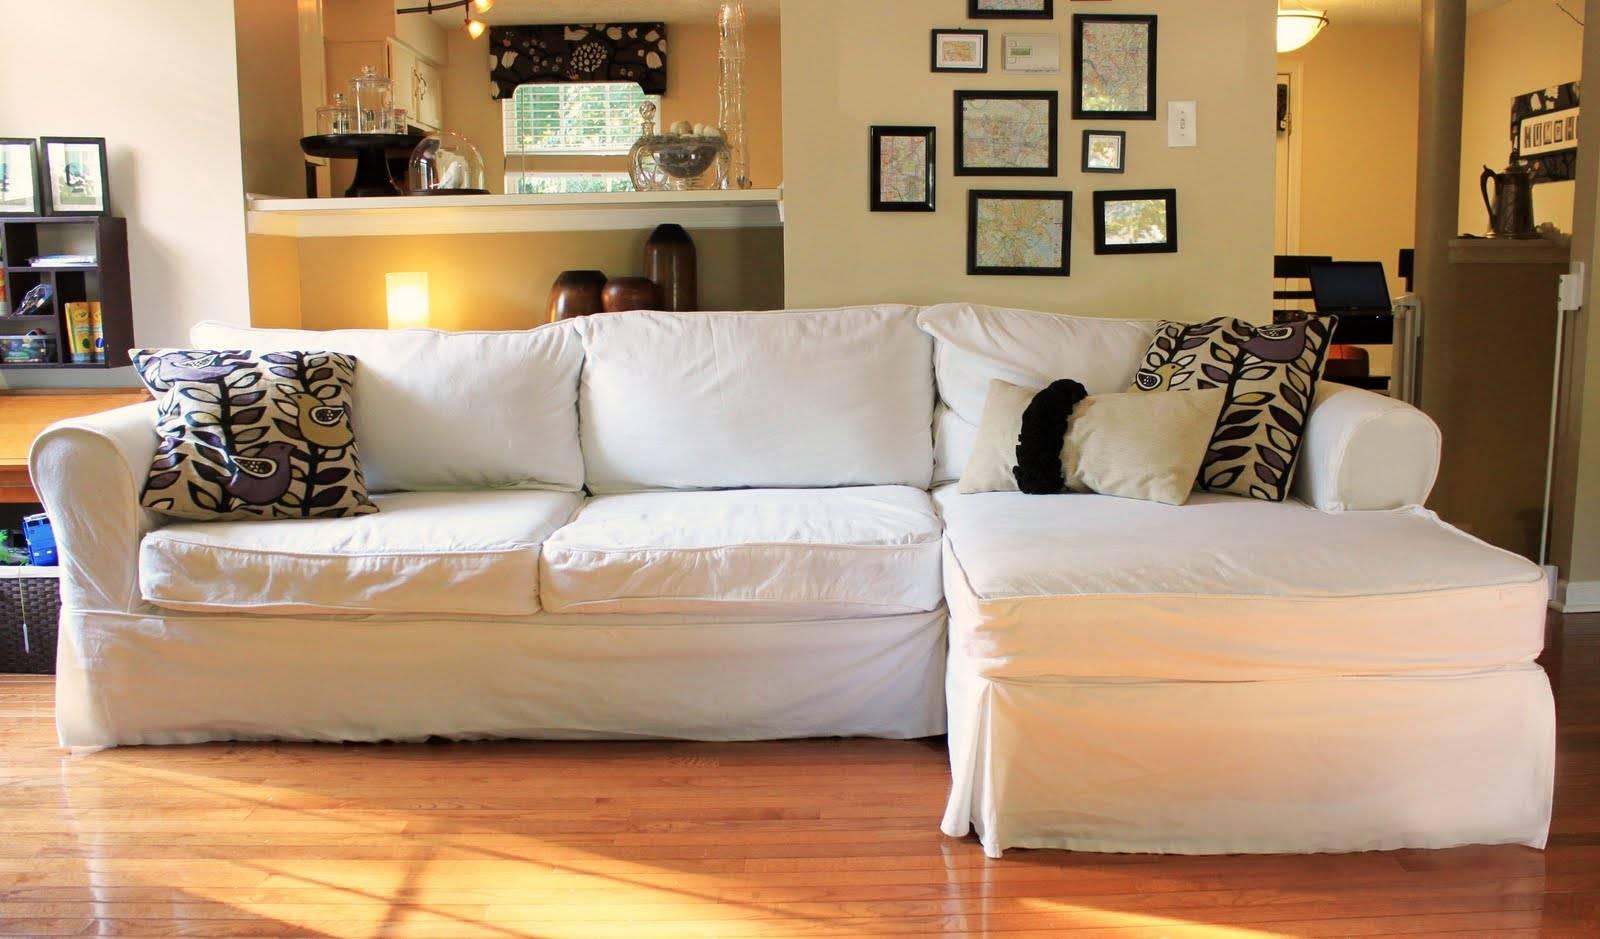 ▻ Sofa : 1 Wonderful Sure Fit Sofa Slipcovers Part 5 Sofa Covers for Large Sofa Slipcovers (Image 26 of 30)